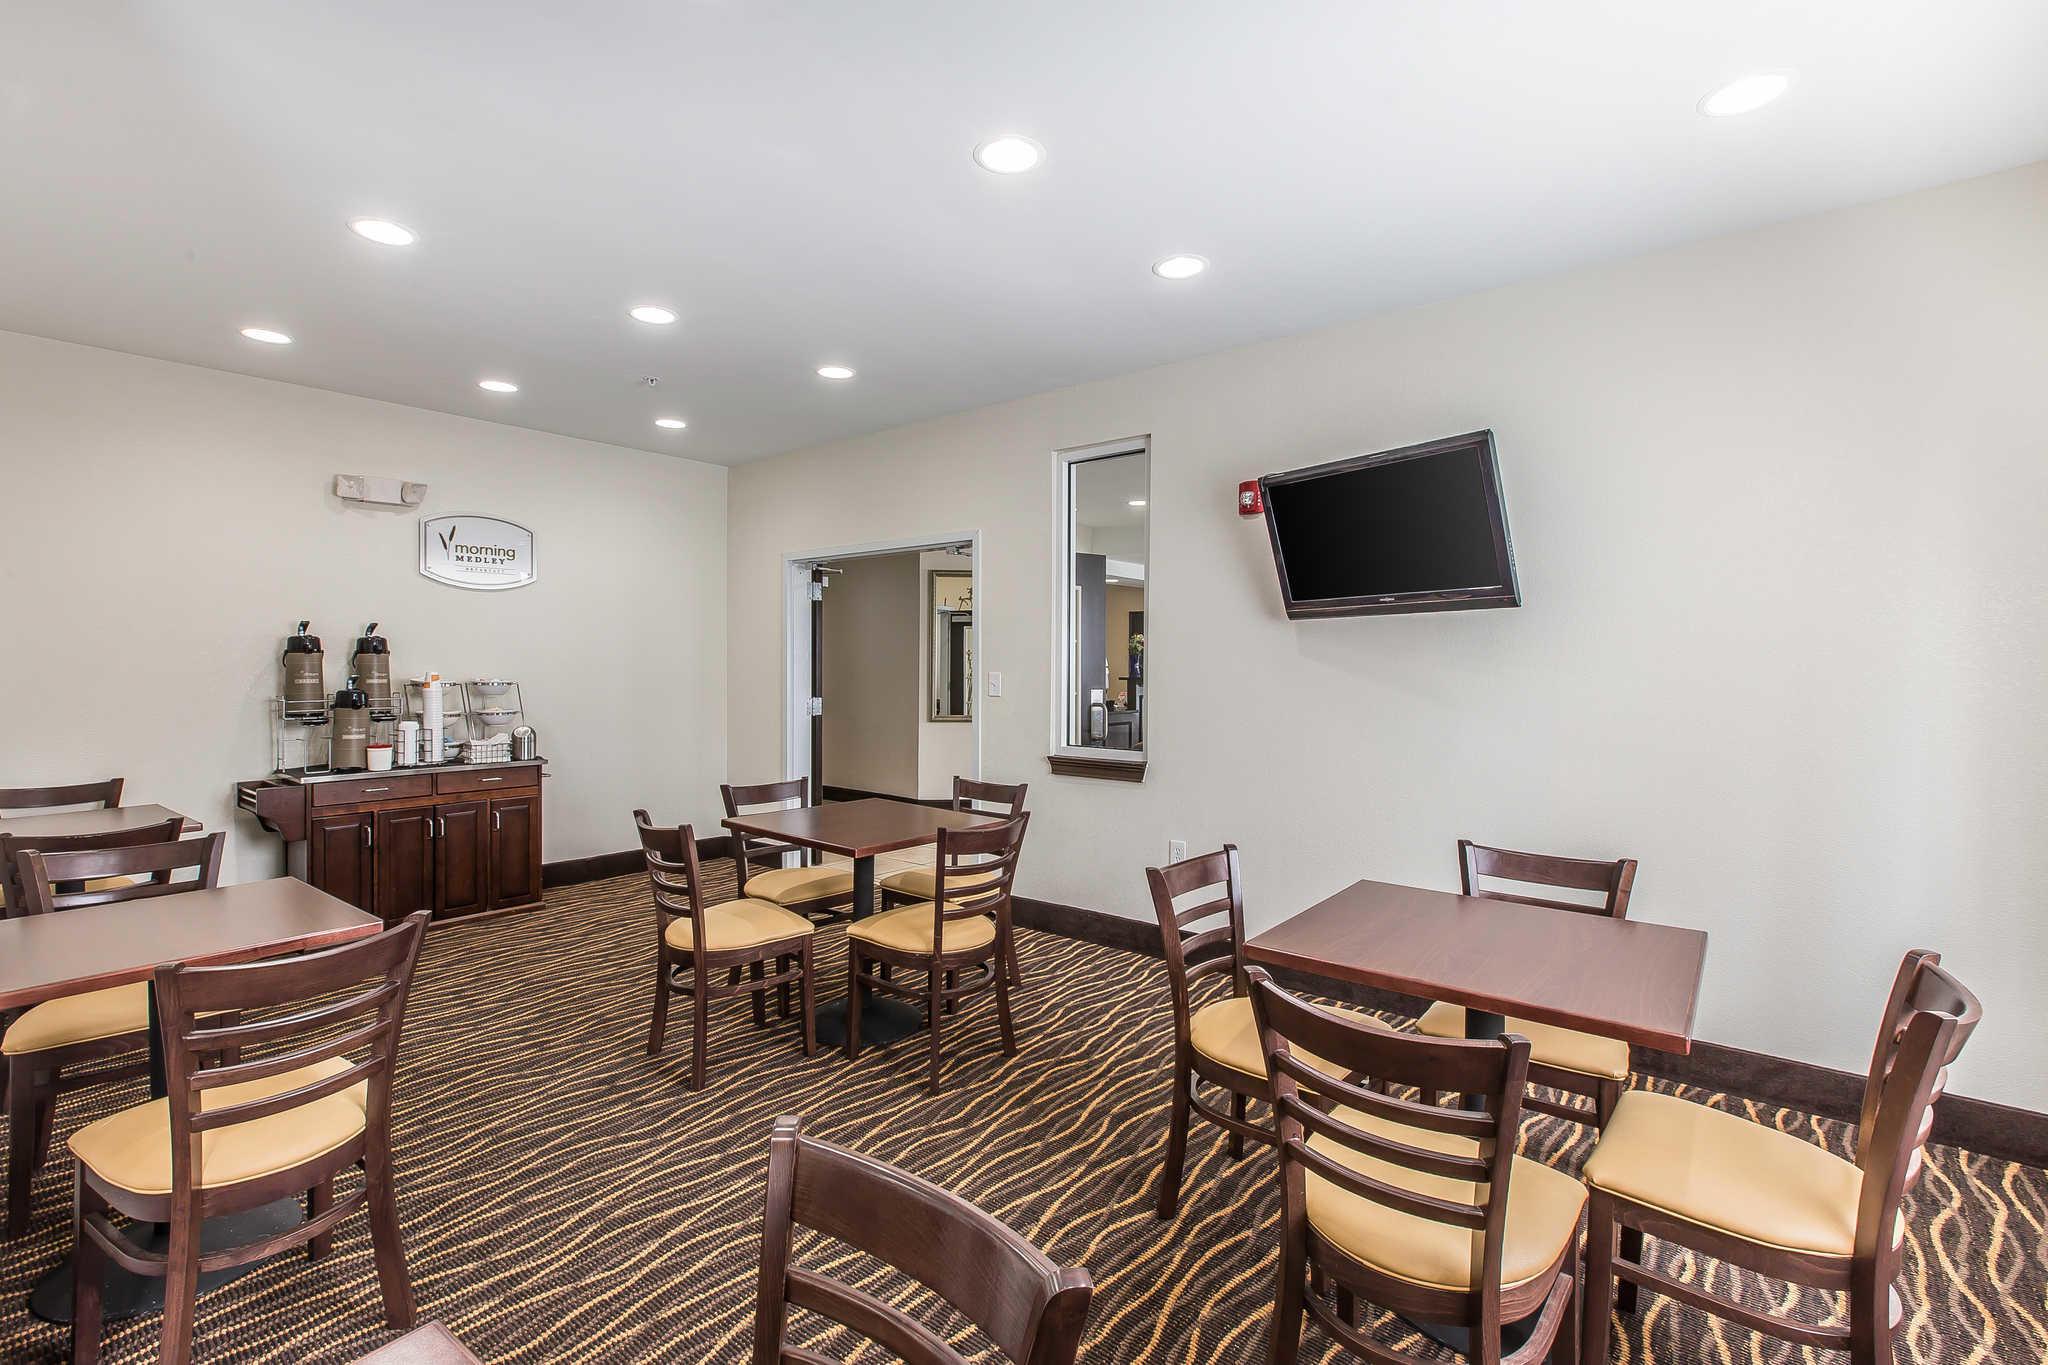 Sleep Inn & Suites At Kennesaw State University image 28